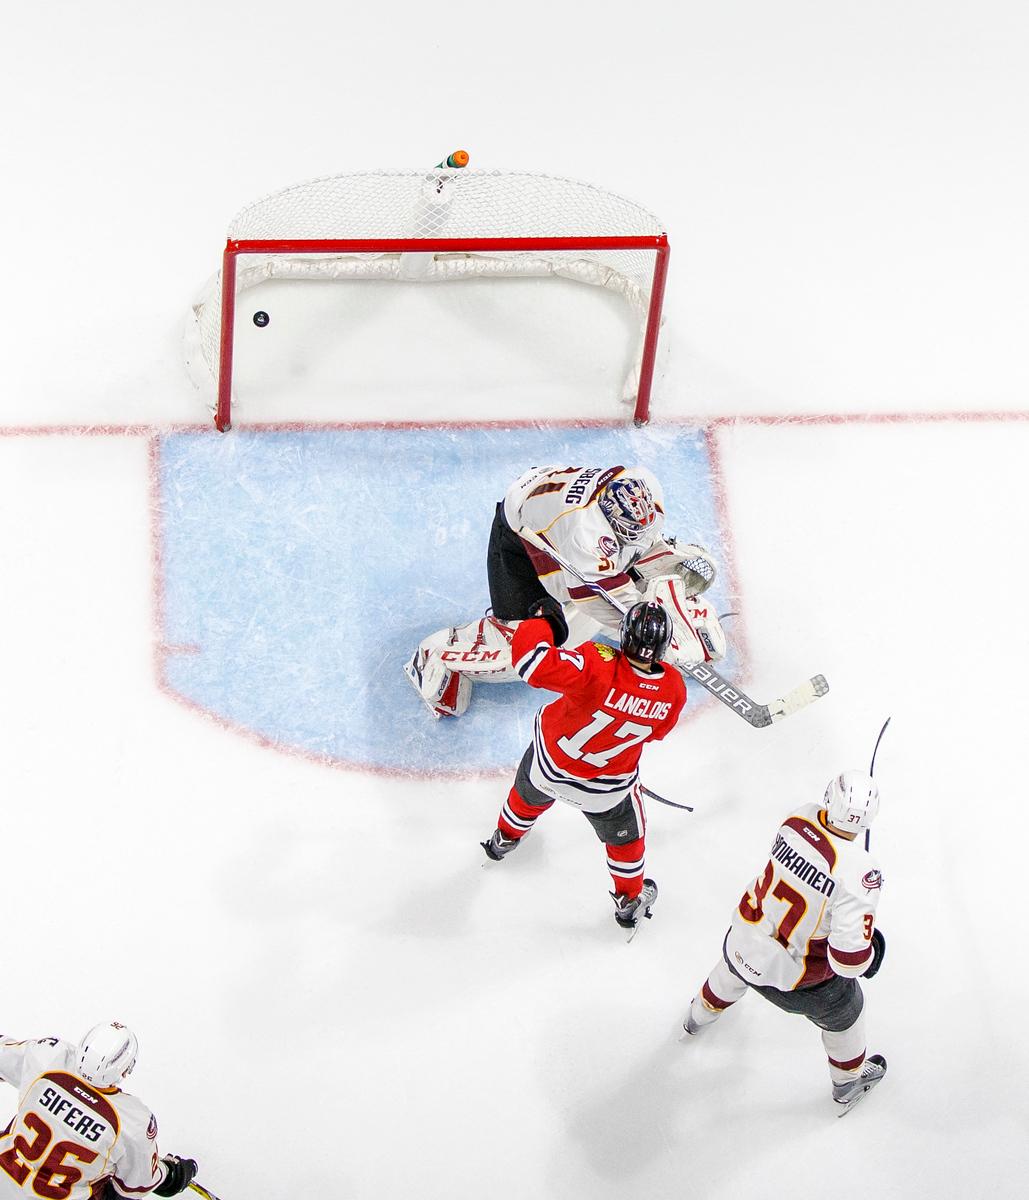 IMAGE: https://photos.smugmug.com/Sports/HockeyPhotos/IceHogs-20162017/02-17-17-IceHogs-vs-Monsters/i-gMbLwvC/0/X3/CC6Q9571_1349-X3.jpg